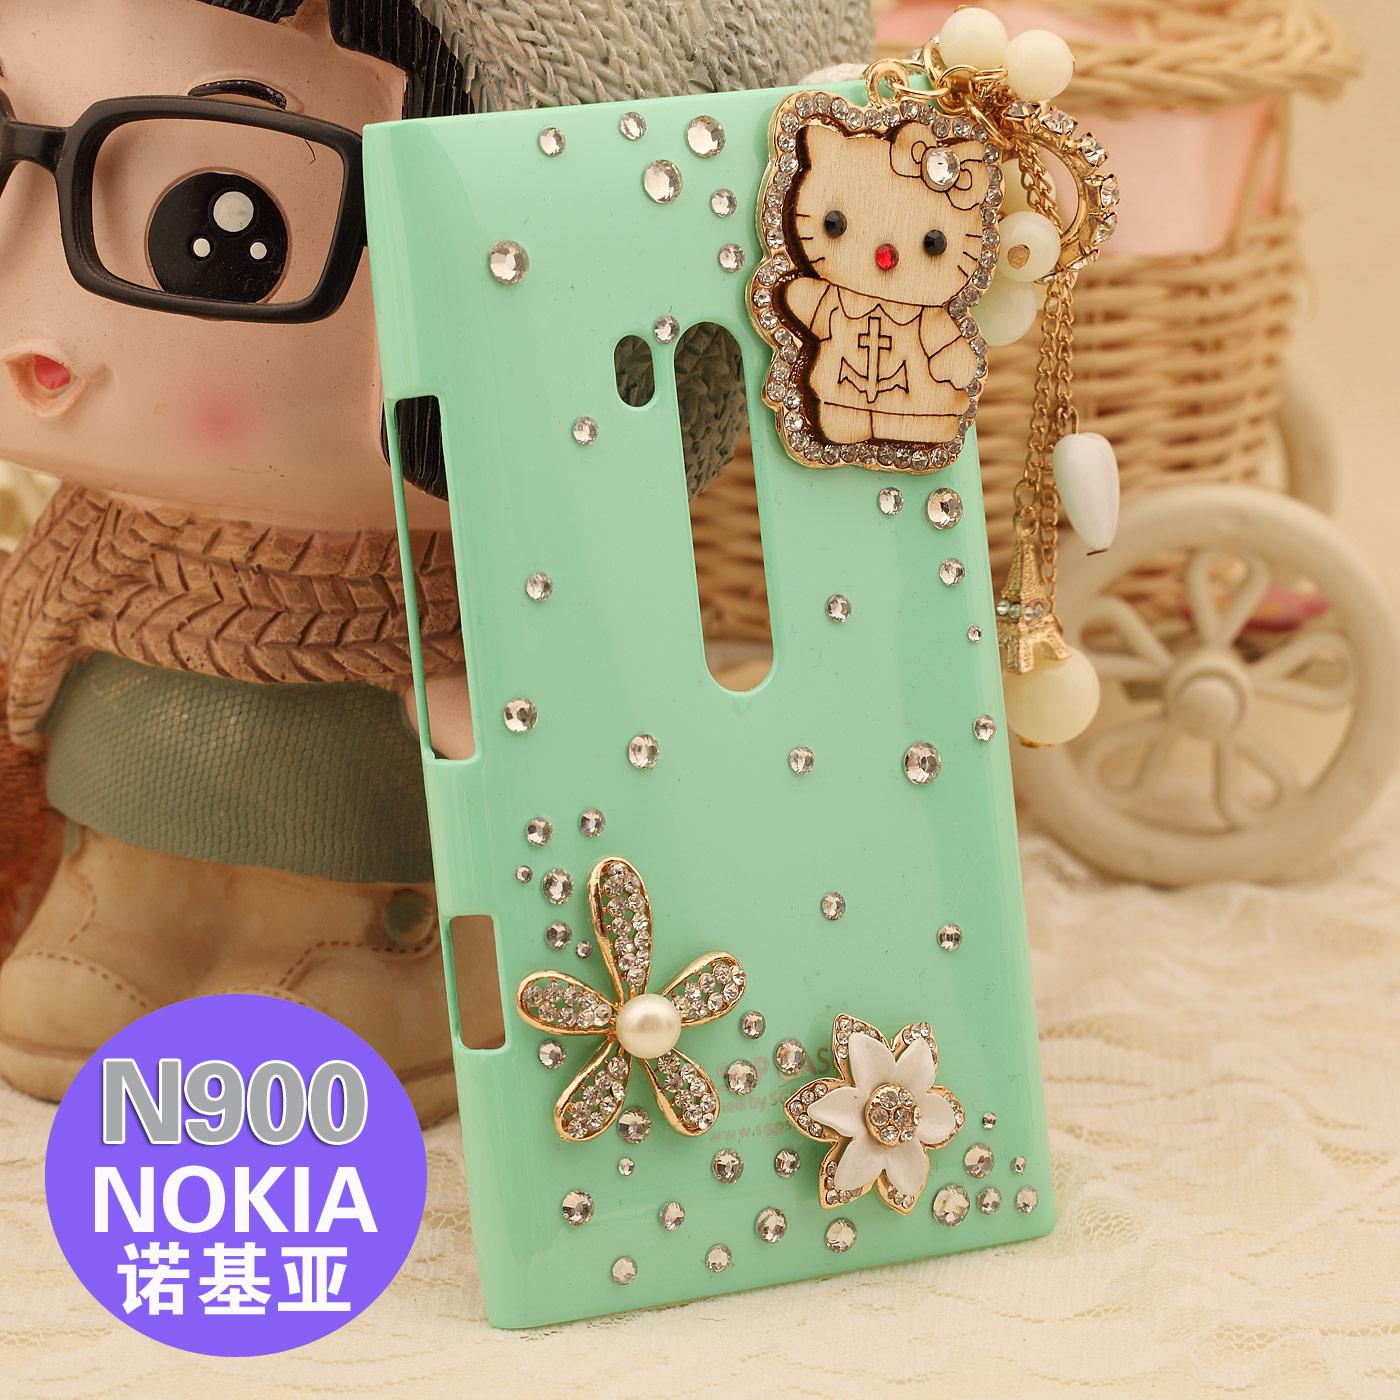 For nokia n900 phone case wool pendant rhinestone for NOKIA n900 protective case mobile phone case shell accessories(China (Mainland))